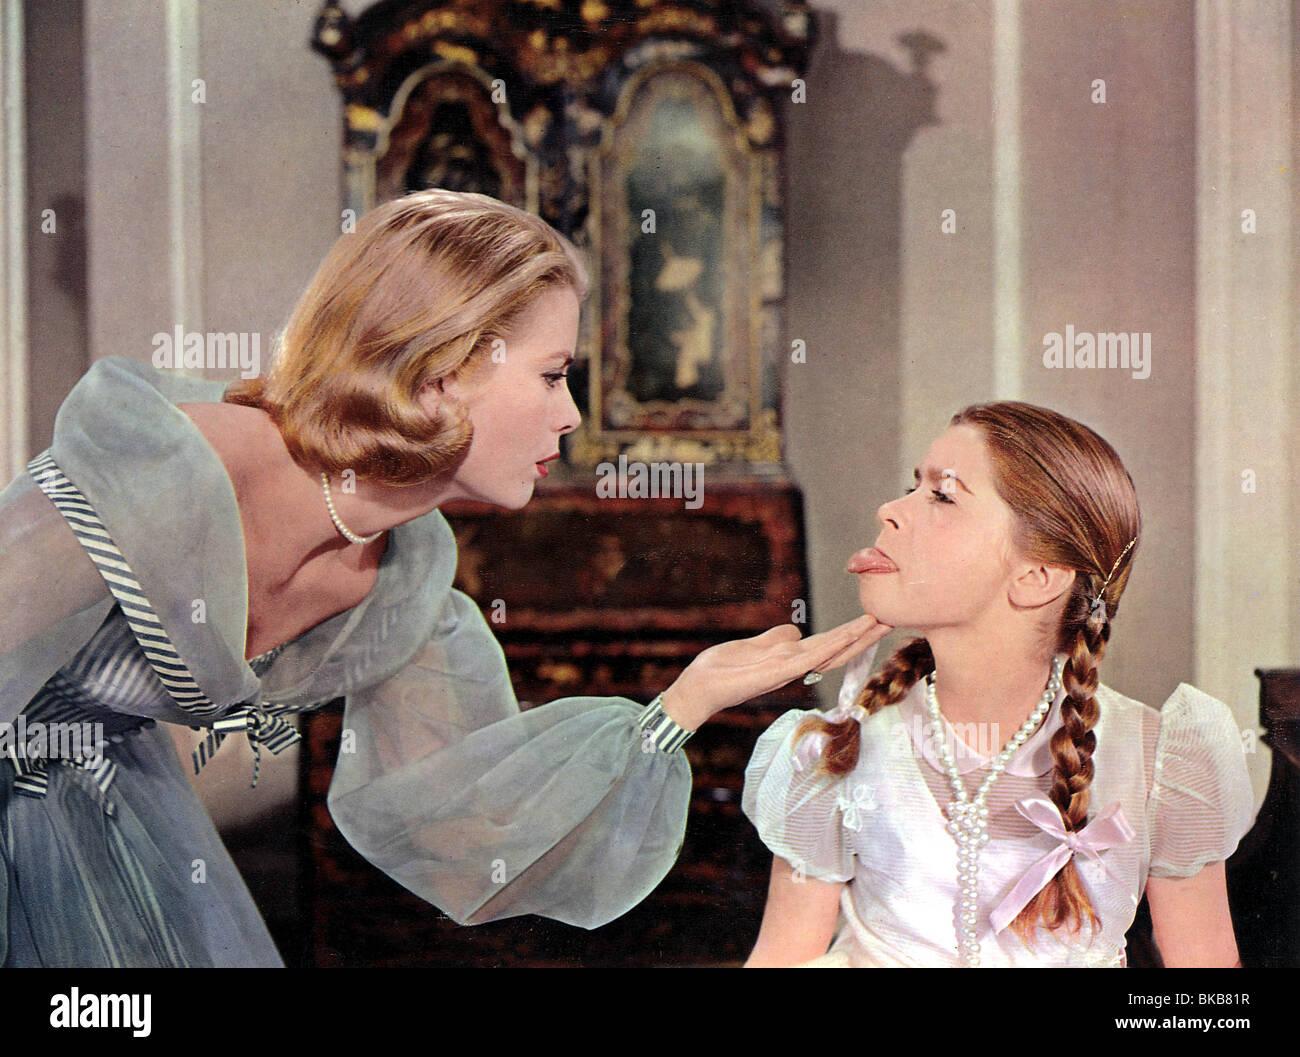 HIGH SOCIETY (1956) GRACE KELLY HGSY 002FOH - Stock Image